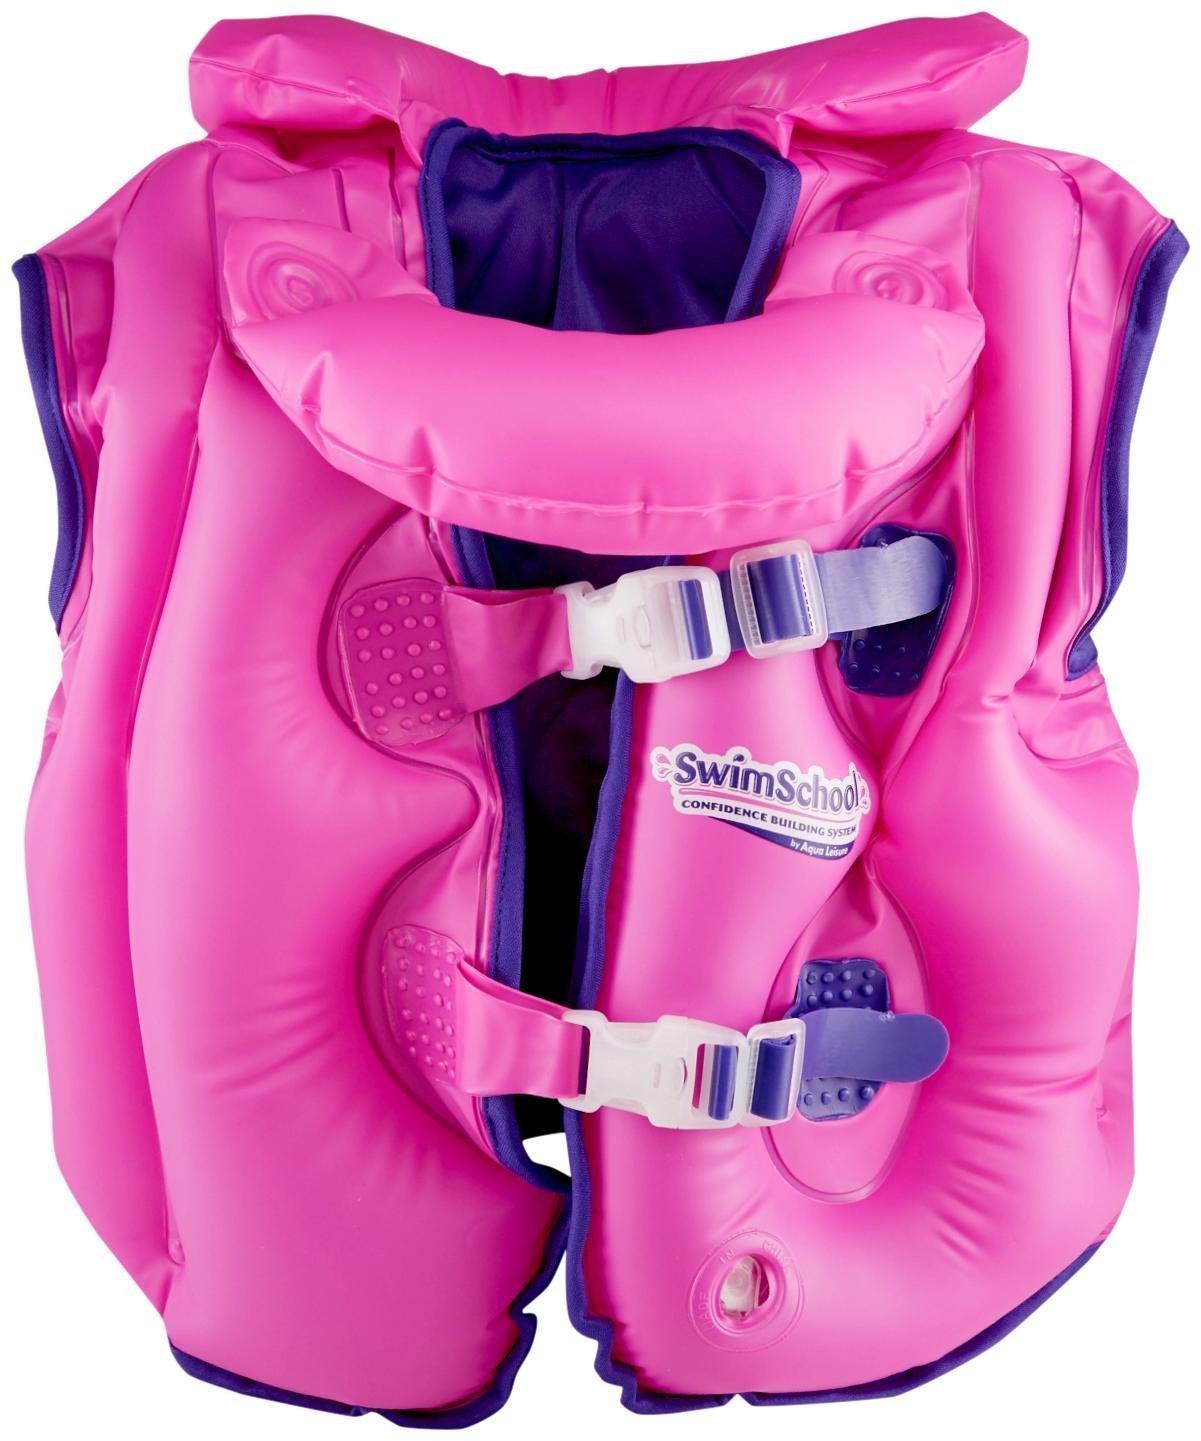 Aqua LeisureファブリックLined Inflatable Swimベスト、取り外し可能な襟、adj.バックル、ピンク   B01ER754ES